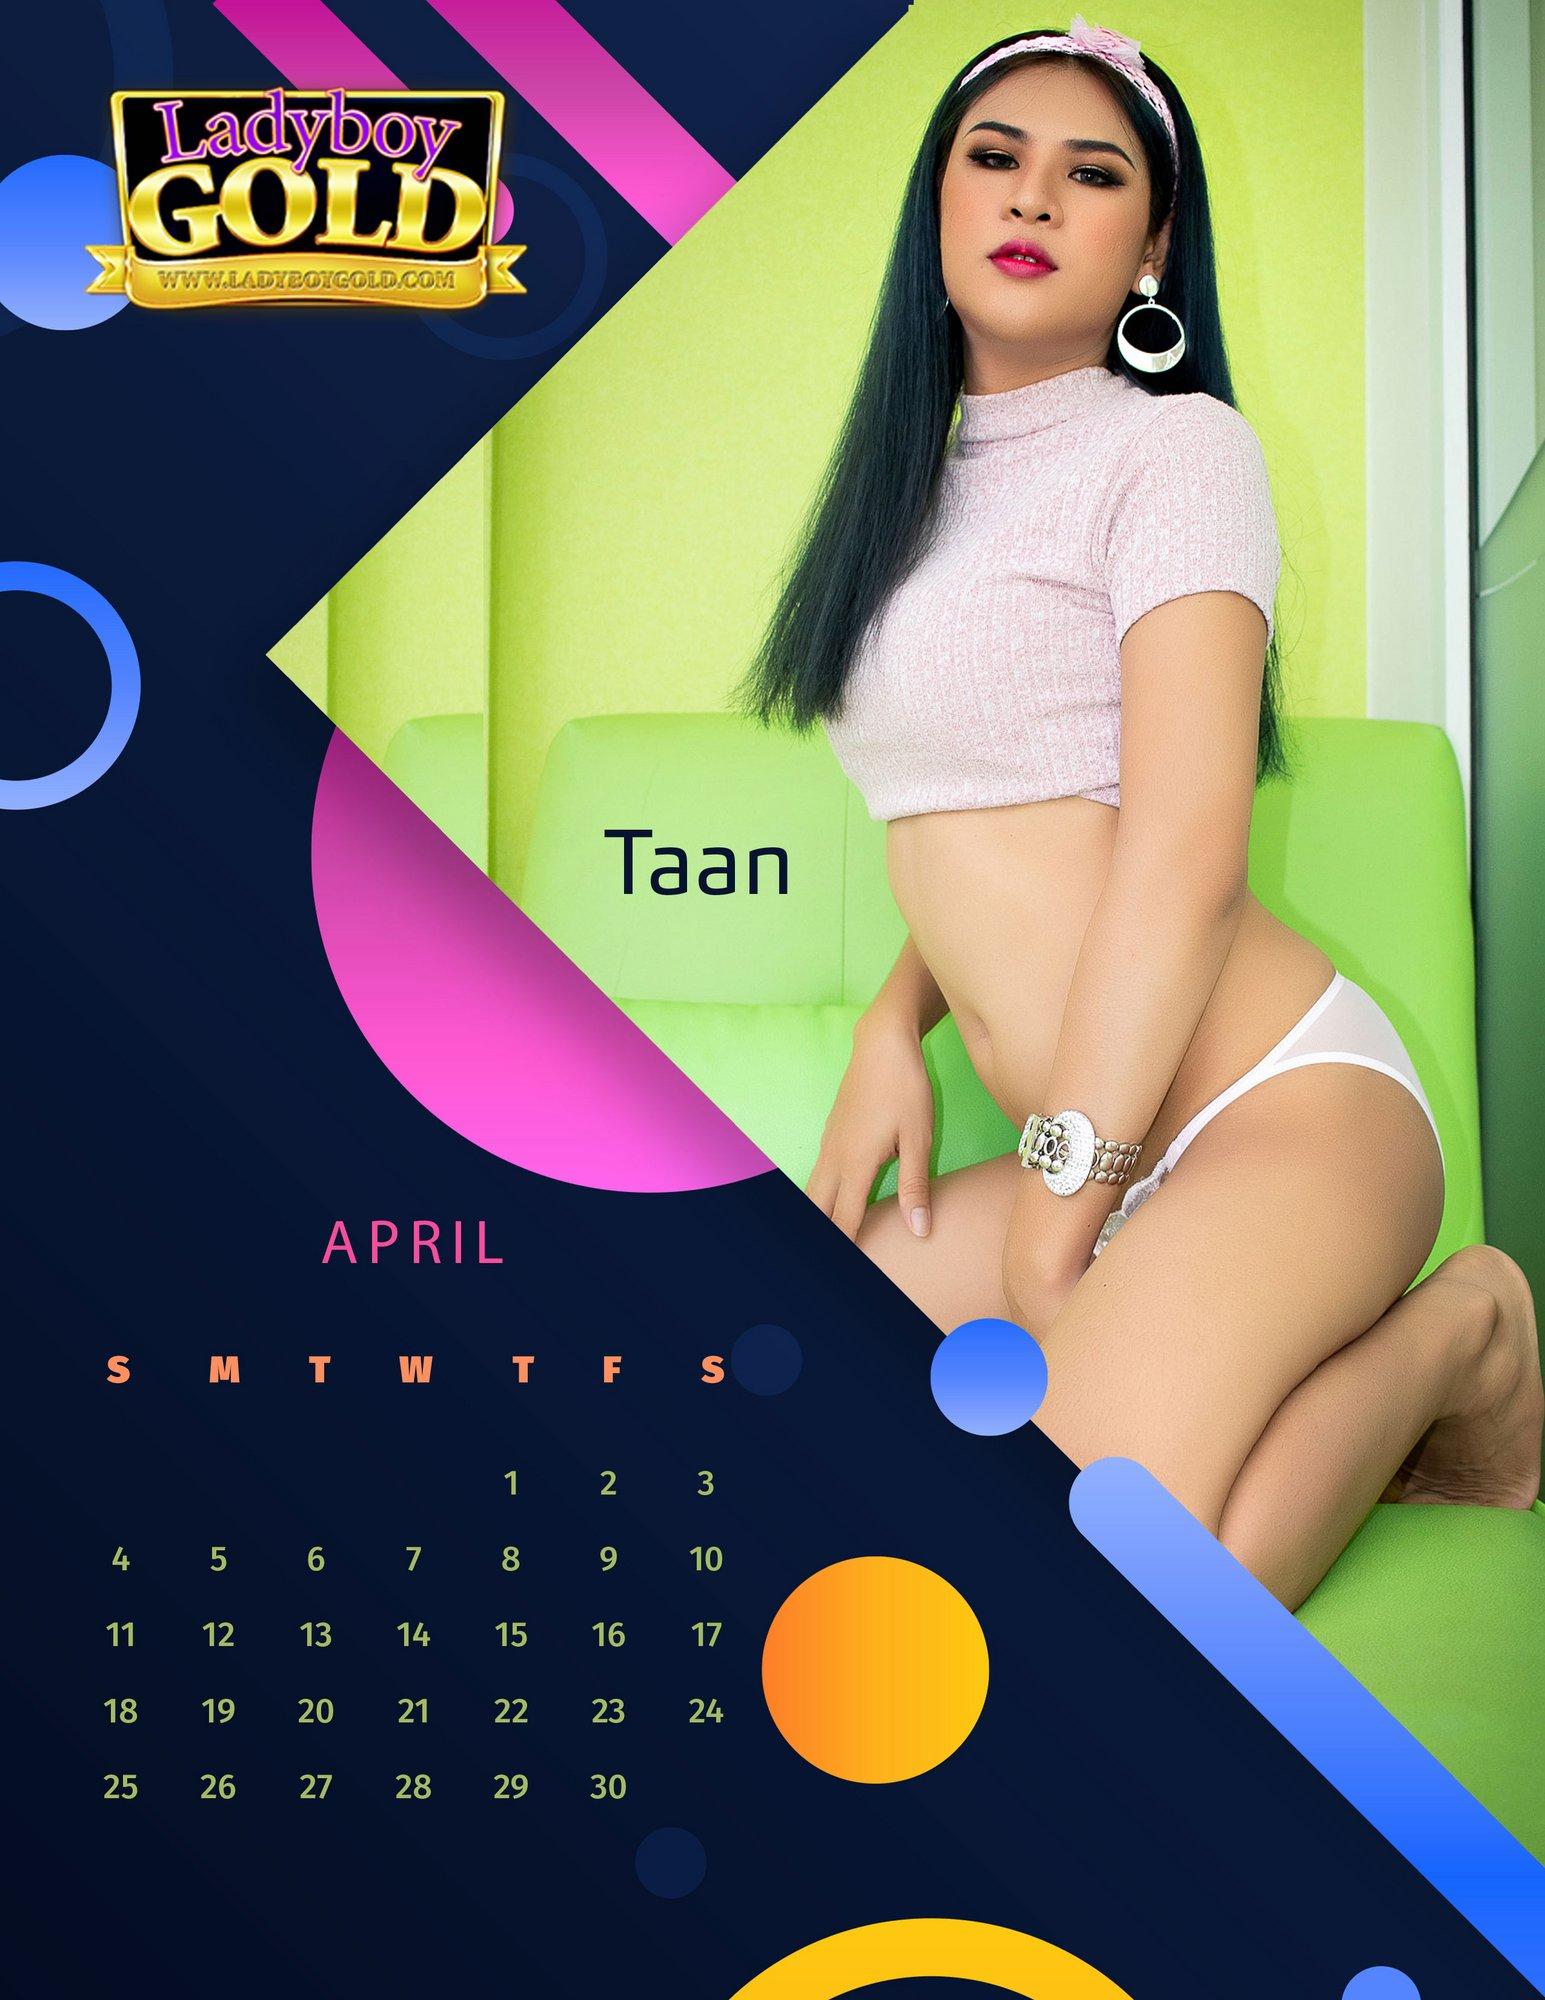 Ladyboy Gold Calendar 2021